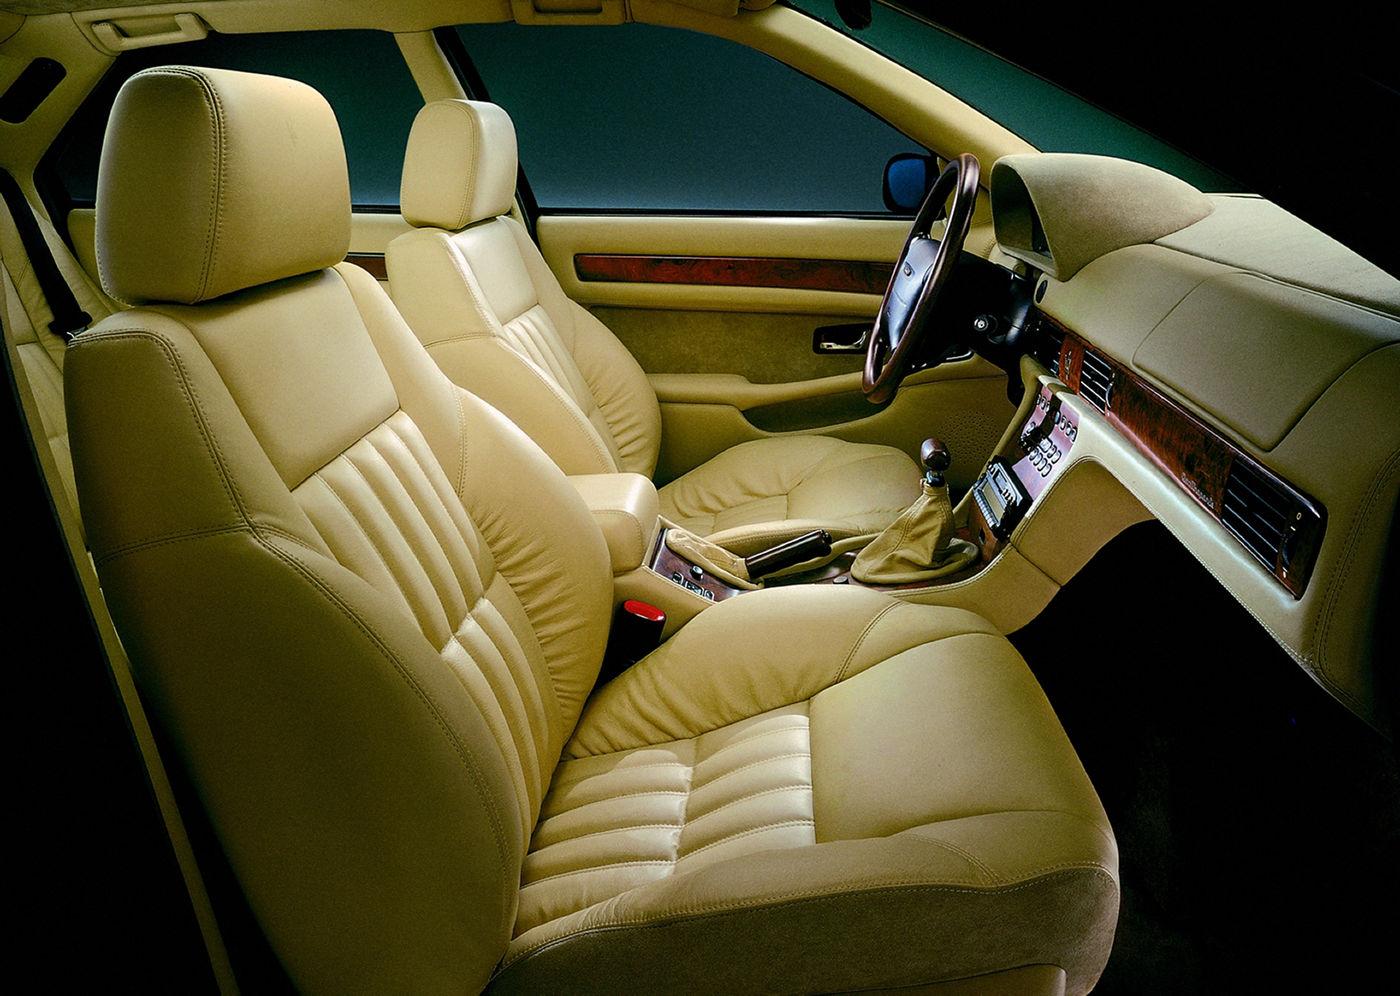 Maserati Classic - Quattroporte IV Evoluzione - design intérieur